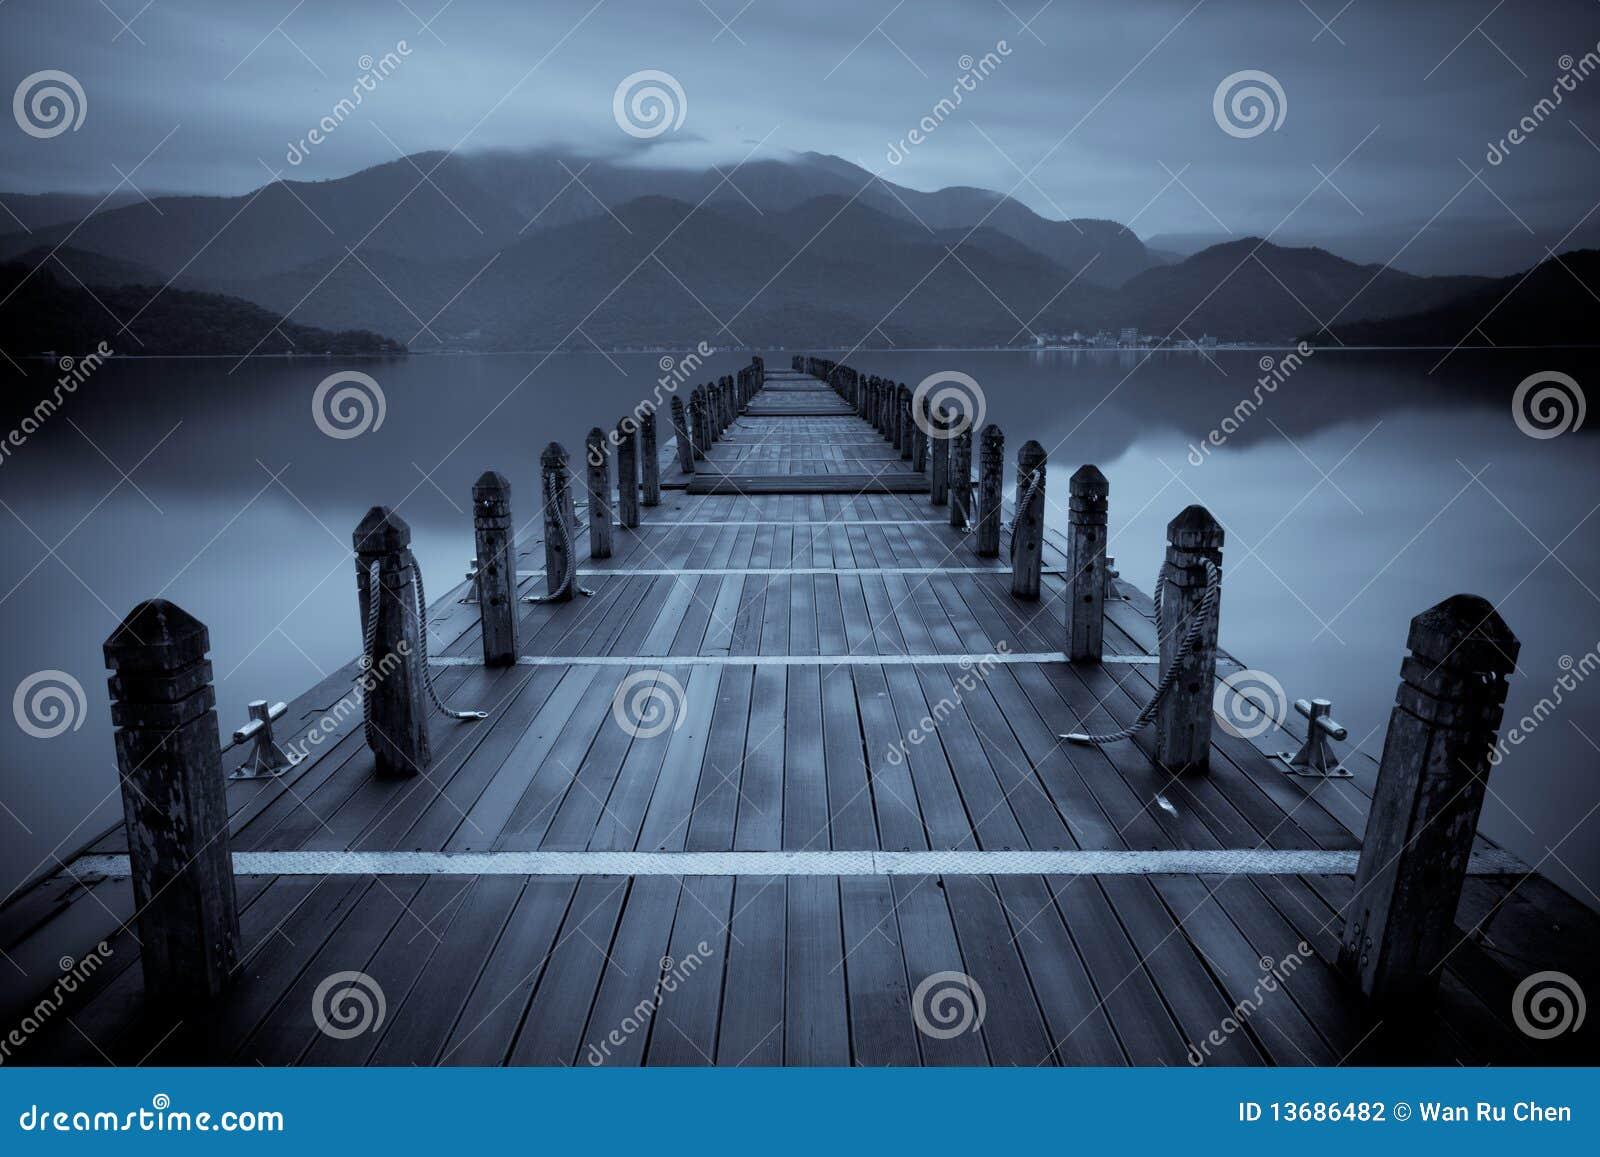 Endloser Nebelsee